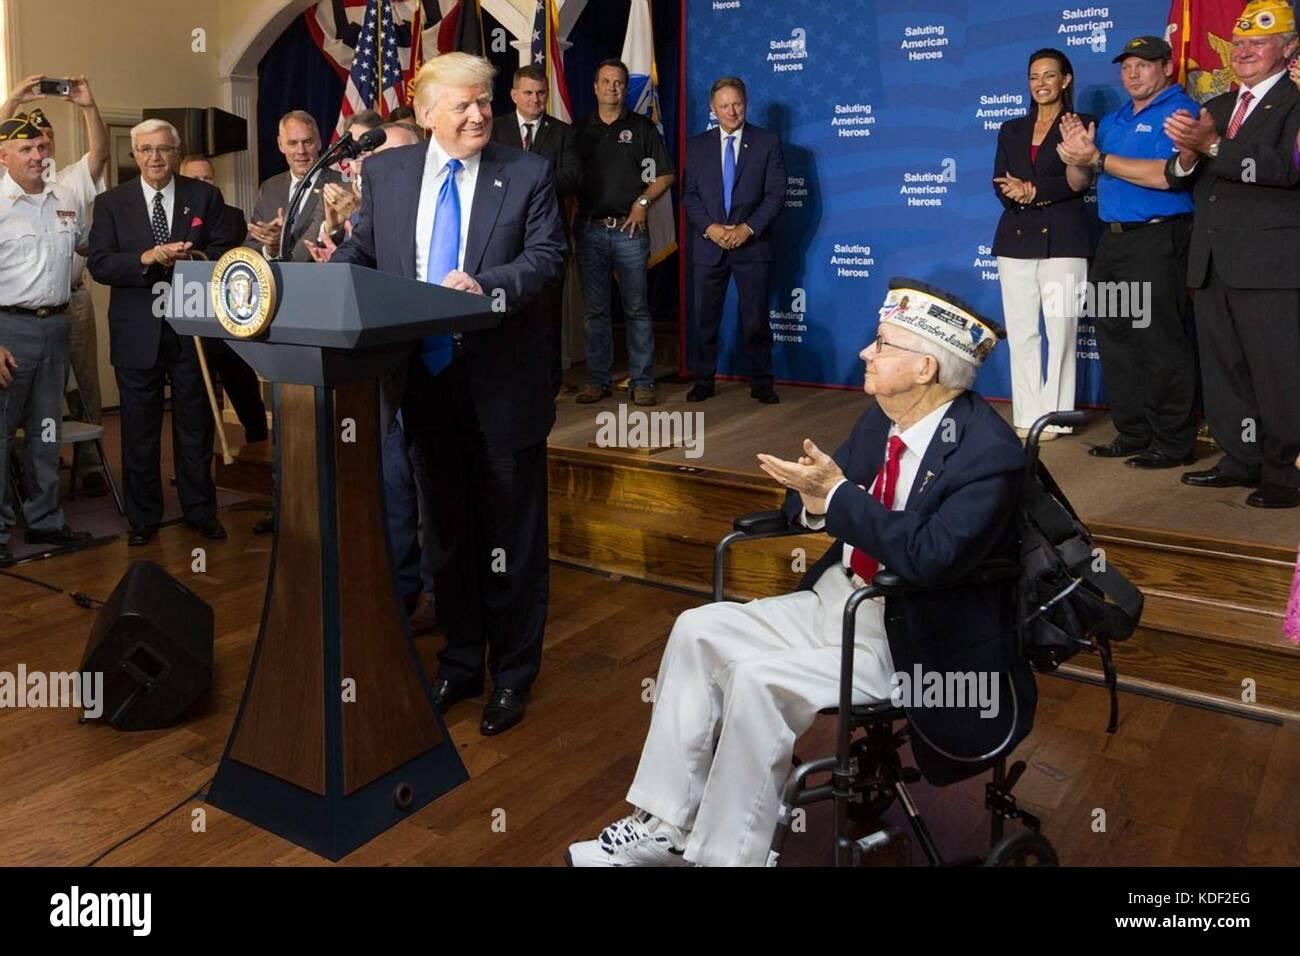 U.S. President Donald Trump honors World War II veteran Bob Bishop during the AMVETS Post 44 Salute to American - Stock Image